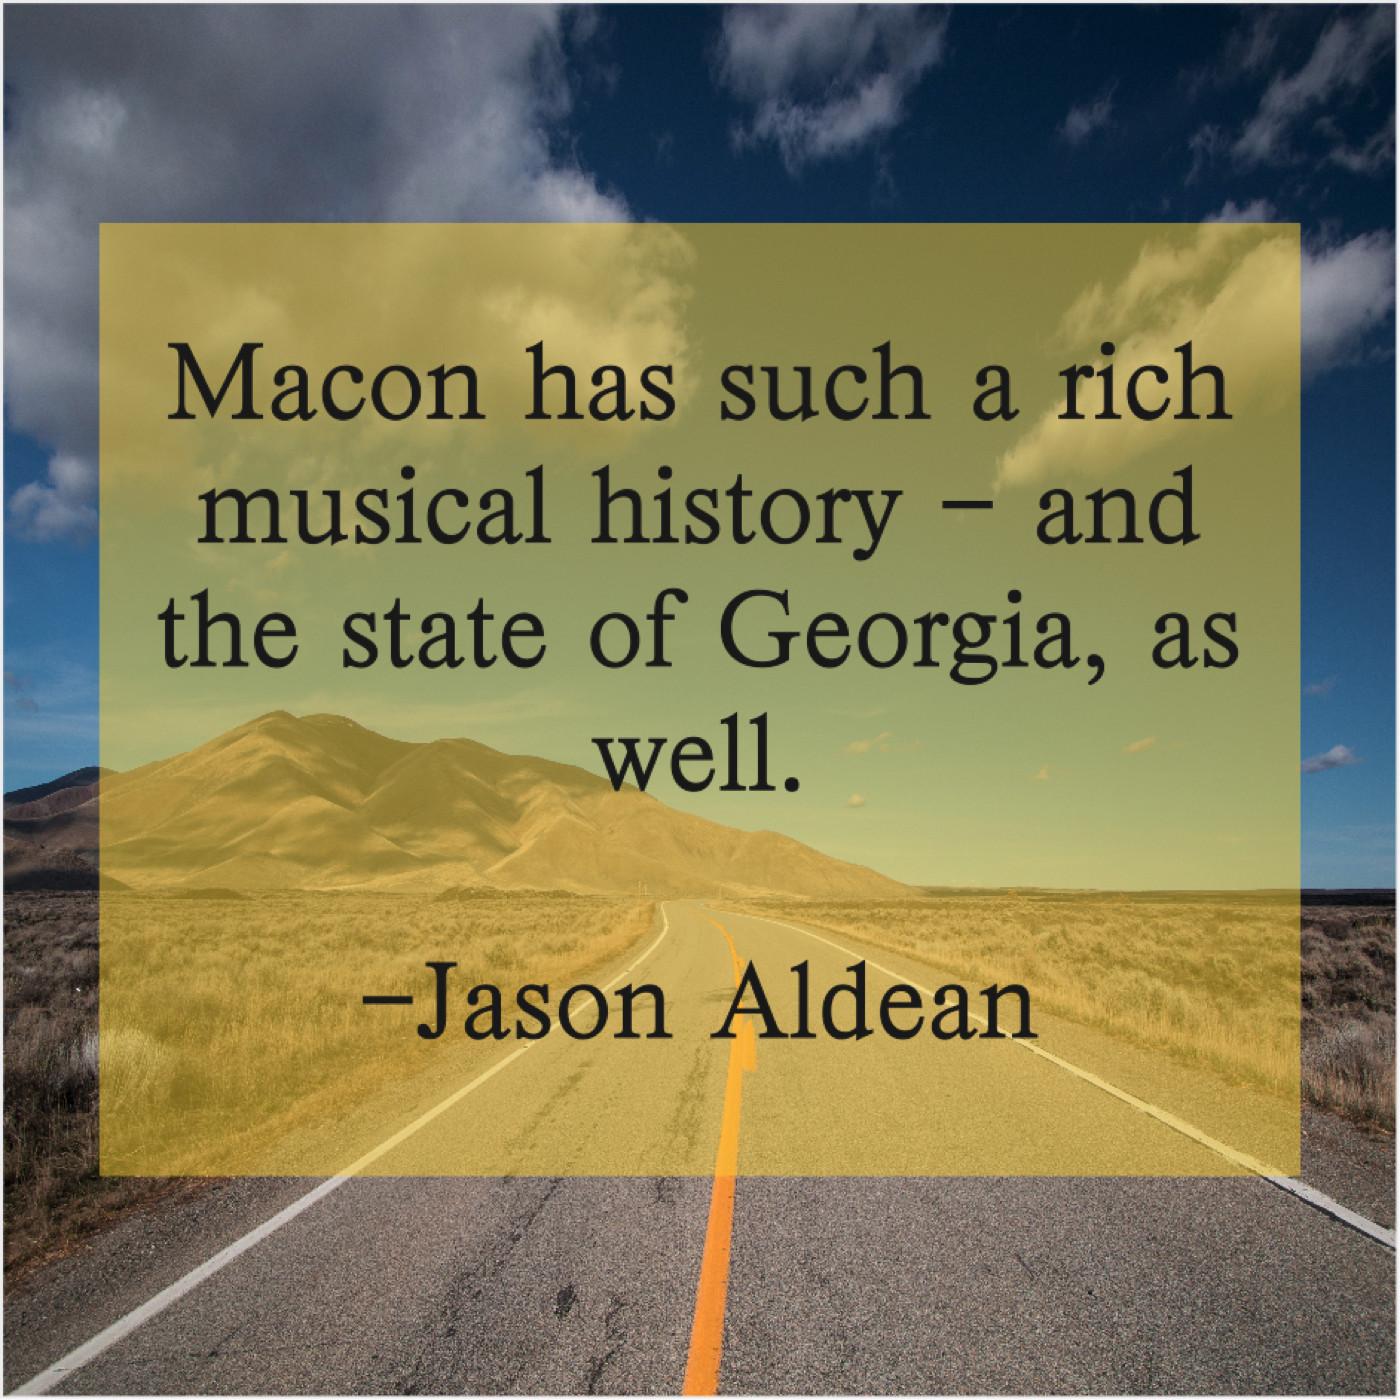 Jason Aldean - Macon has such a rich... - Quote Trumpet